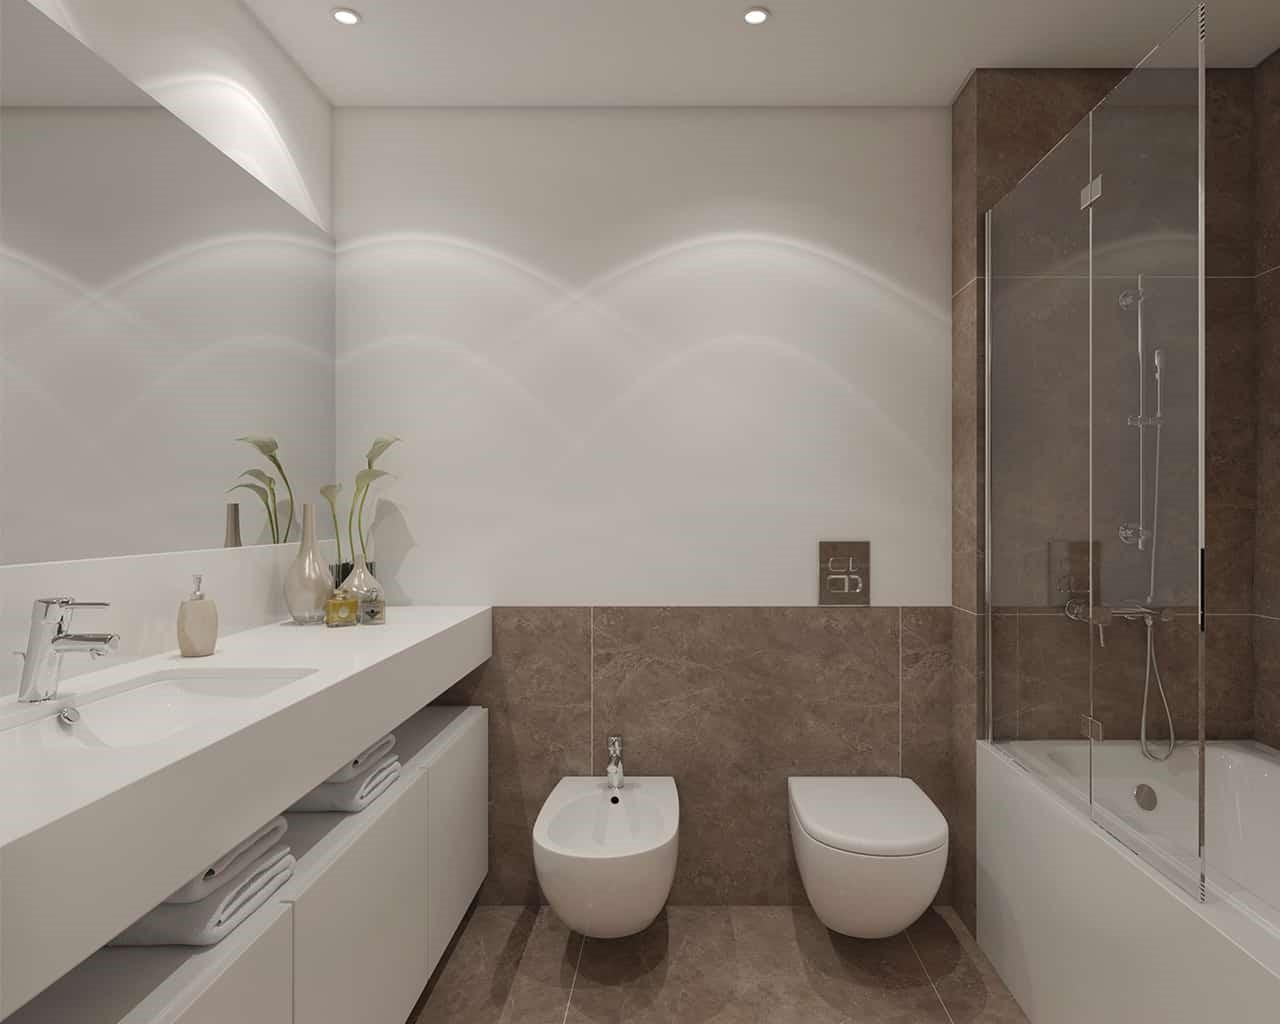 areeiro-prime-salle de bain-option urban trend